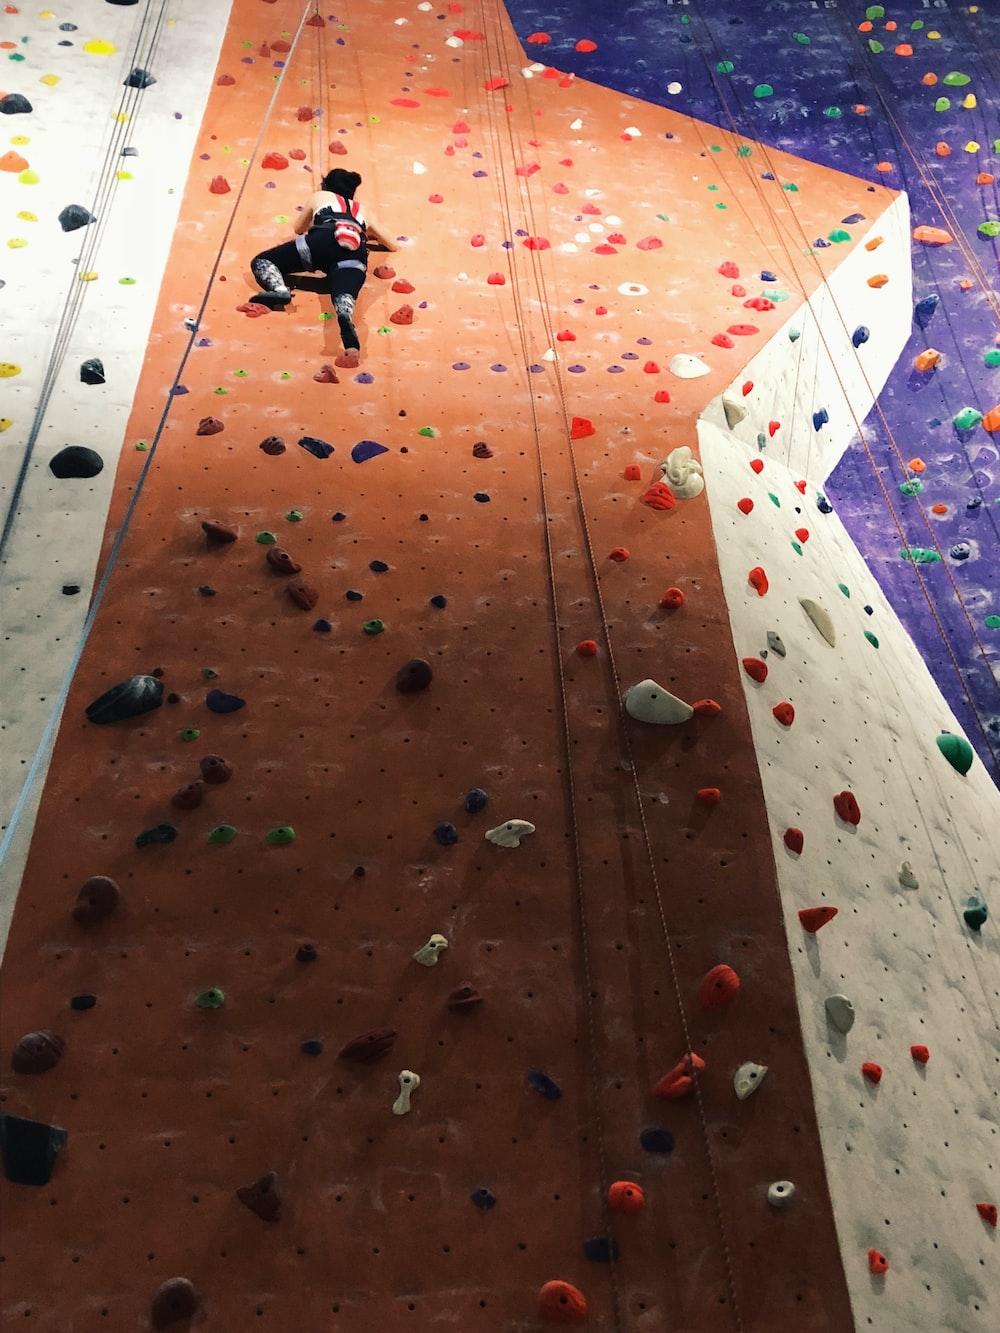 person wall climbing